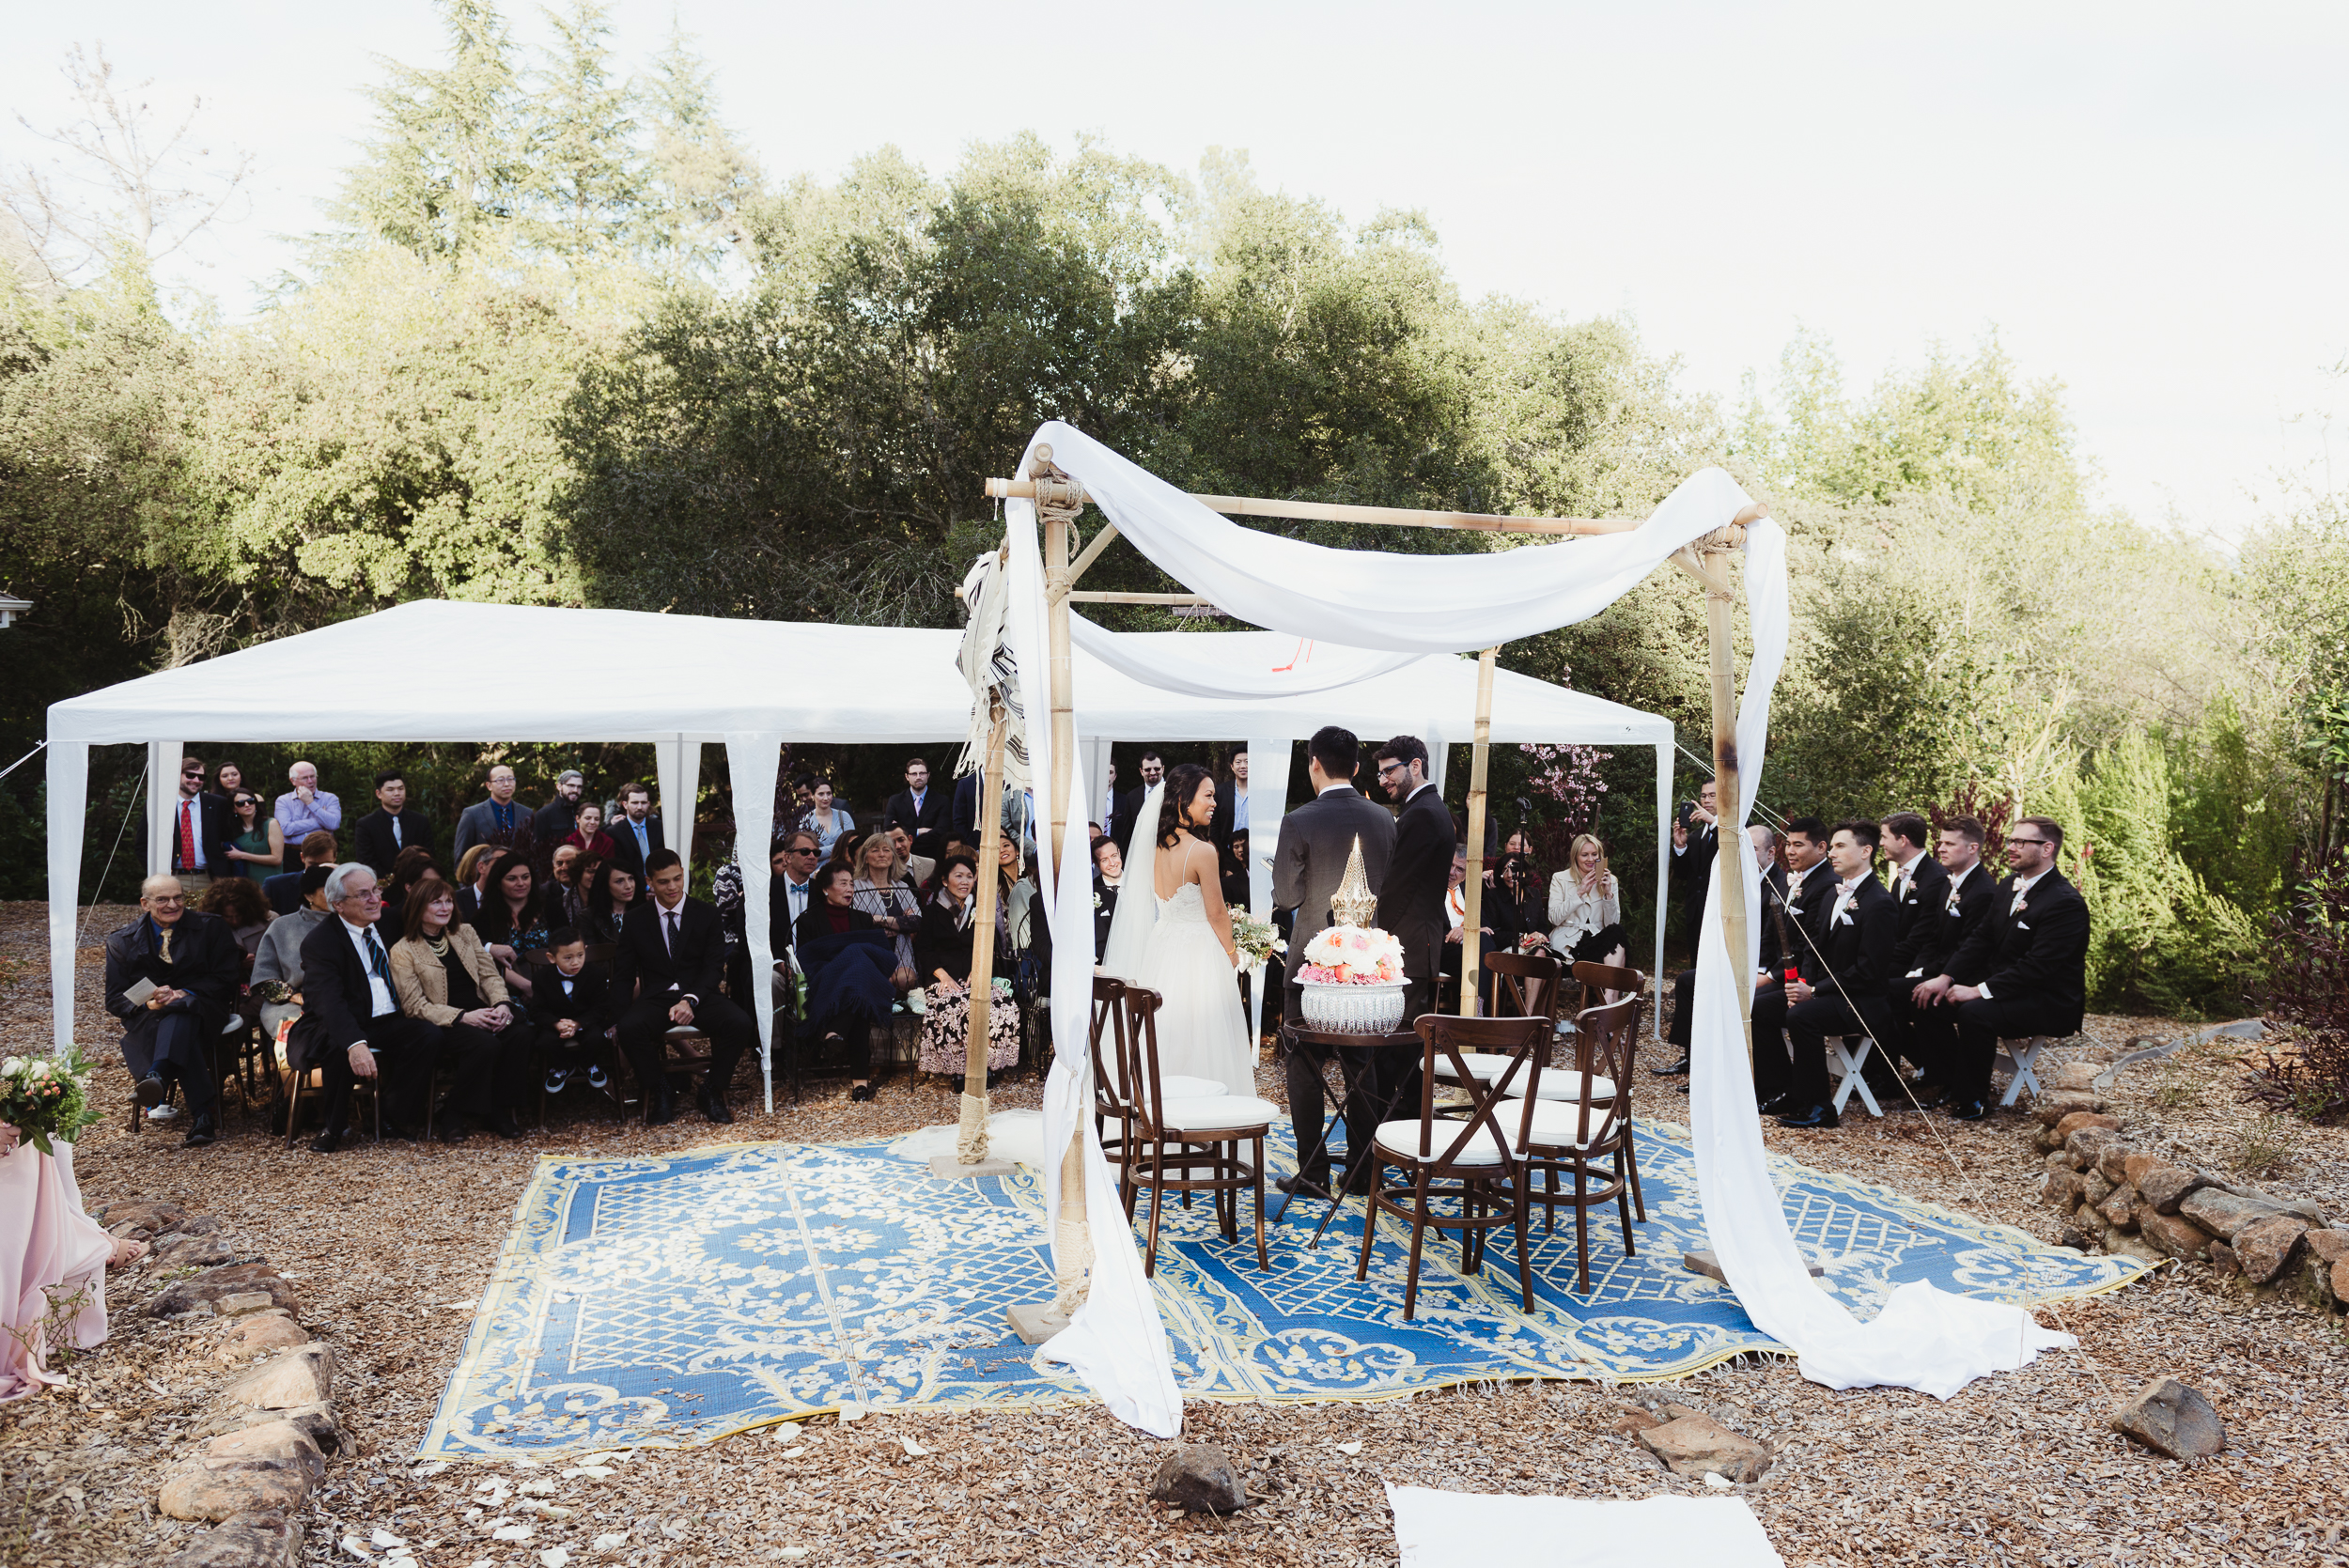 18-woodside-backyard-wedding-vivianchen-0382.jpg